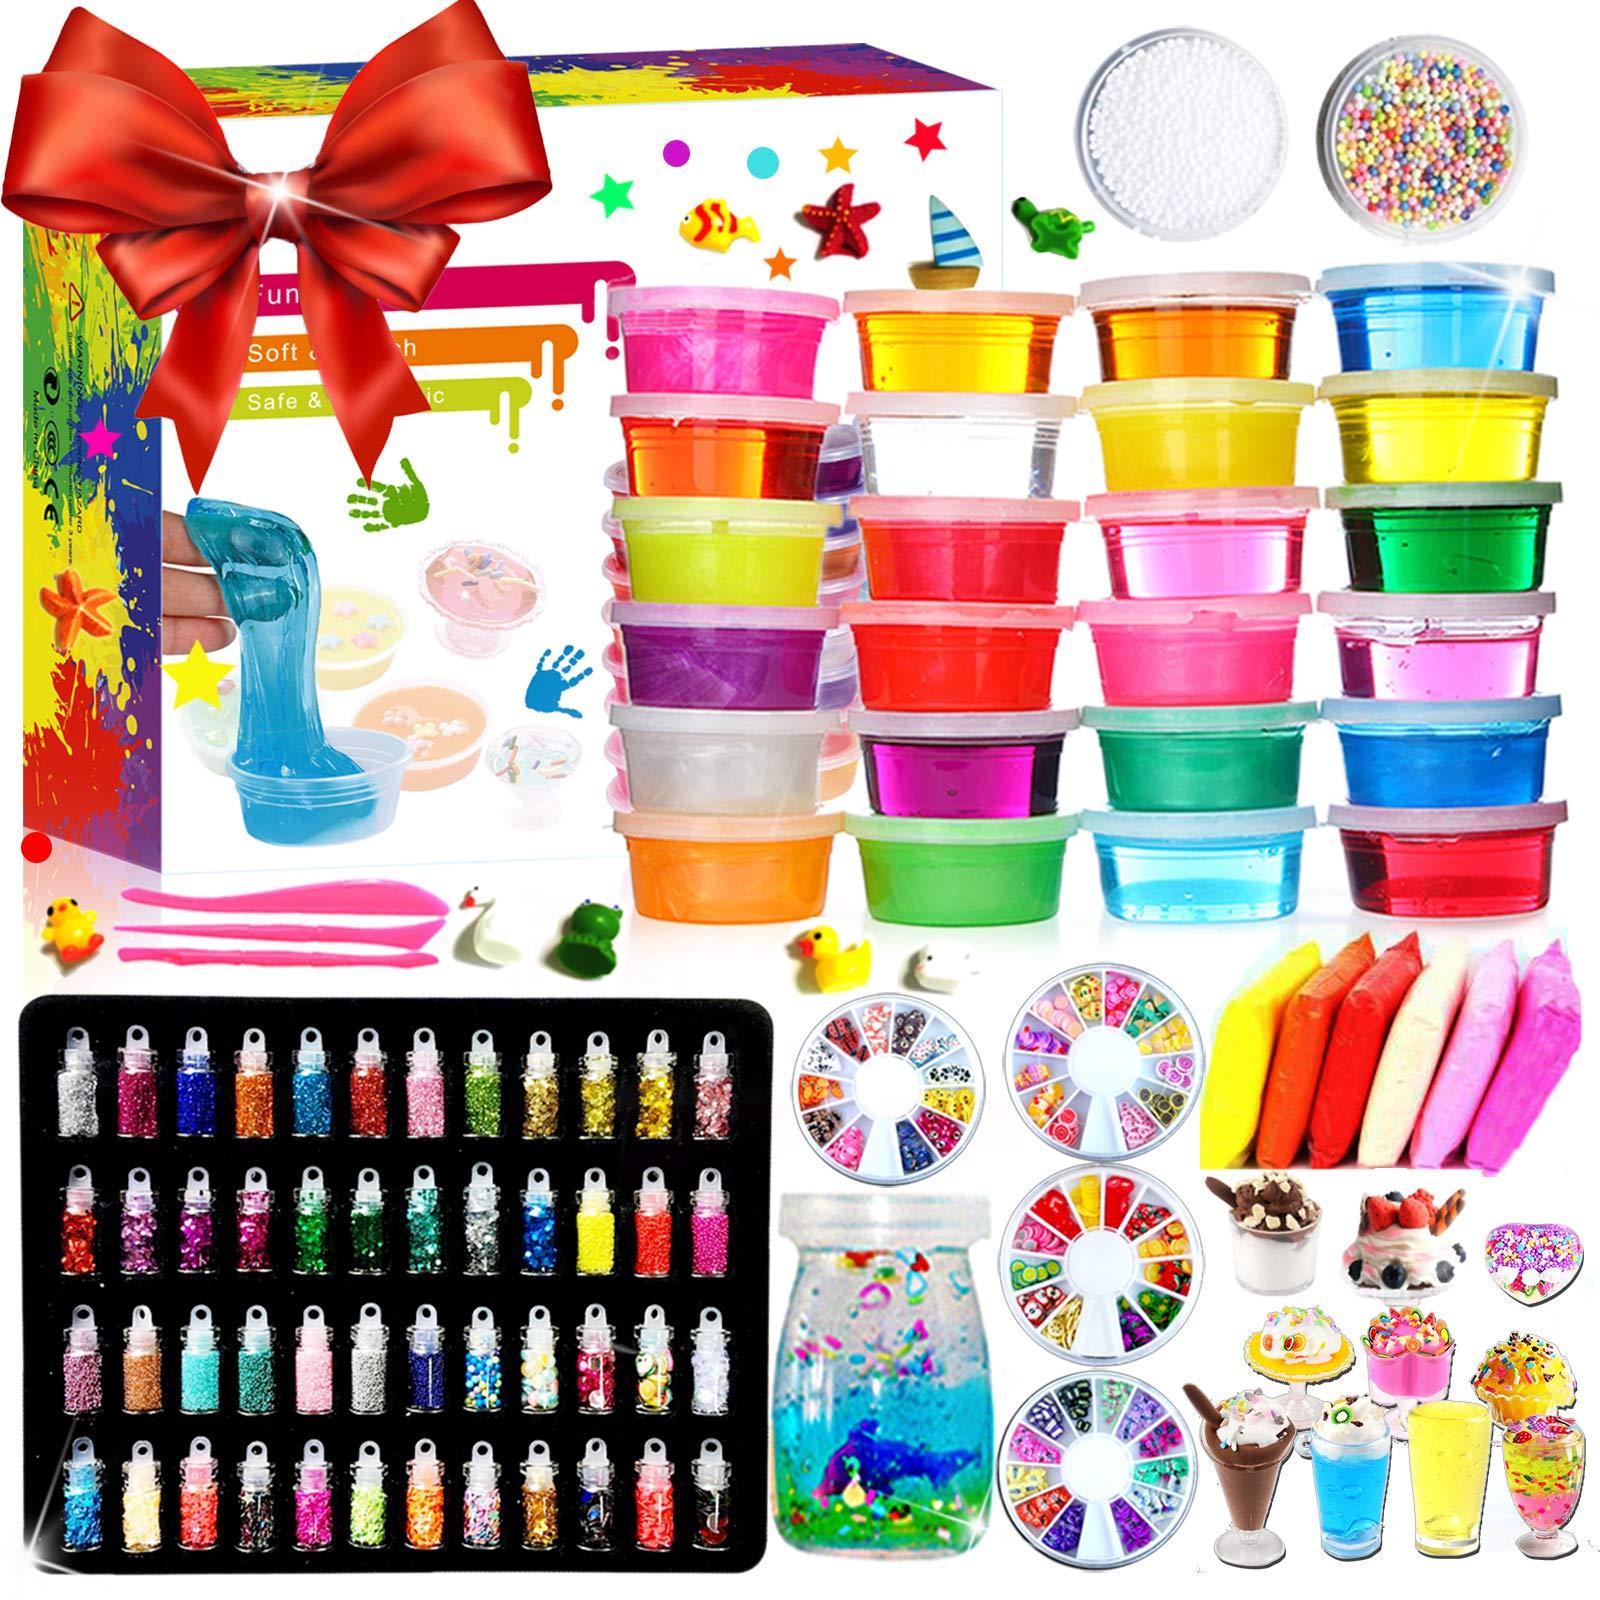 DIY Fluffy Slime Kit Crystal Slime Set for Girls Boys Toys Kids Art Craft aged 6+ (24 colors)